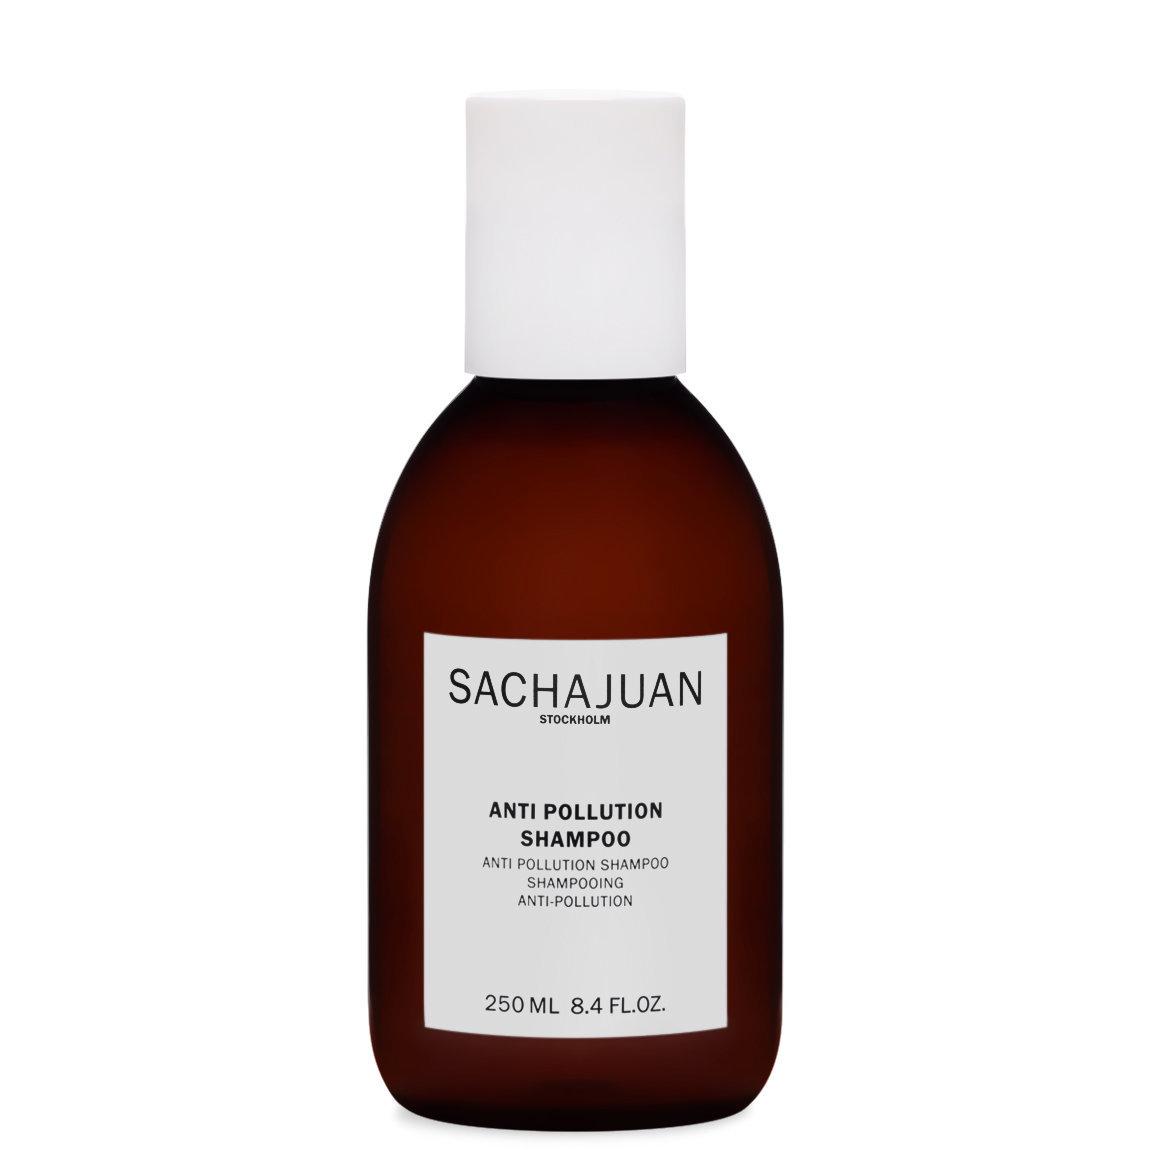 SACHAJUAN Anti-Pollution Shampoo alternative view 1 - product swatch.